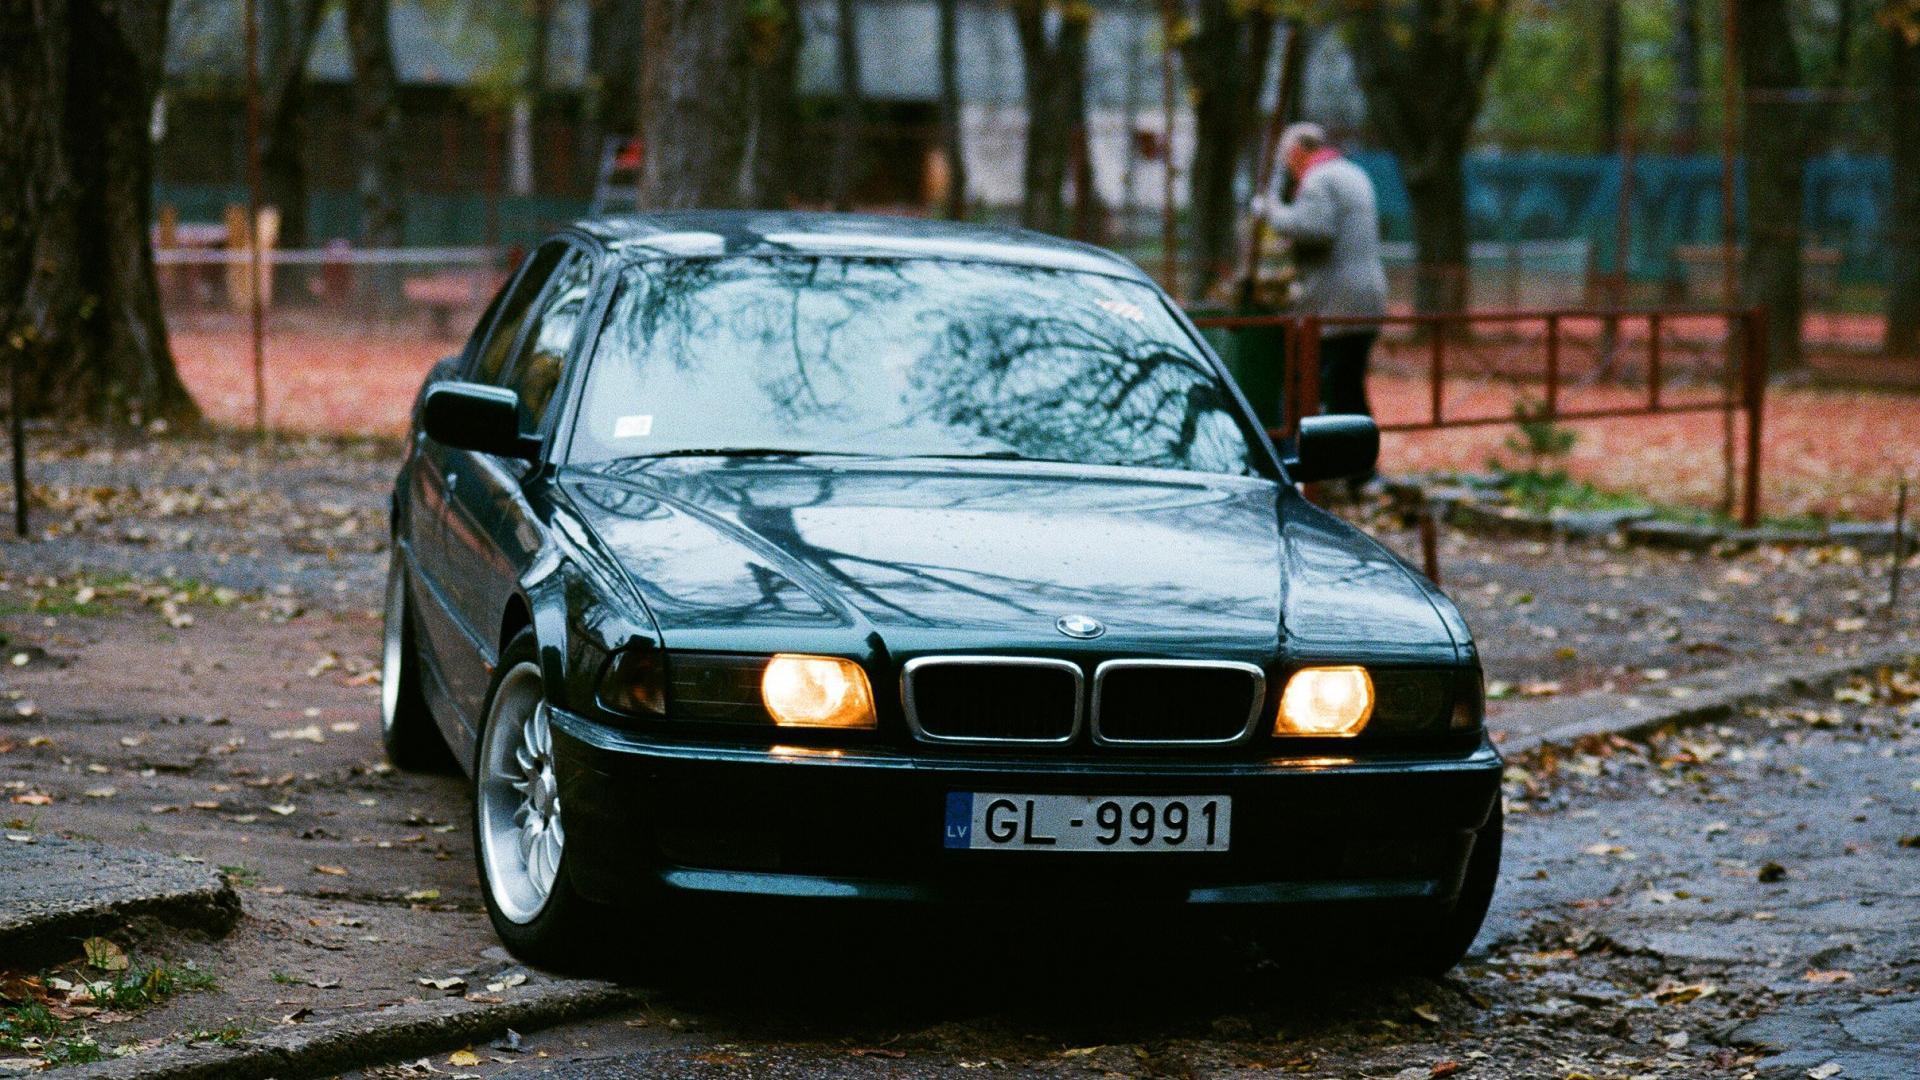 Картинка: bmw, автомобиль, бумер